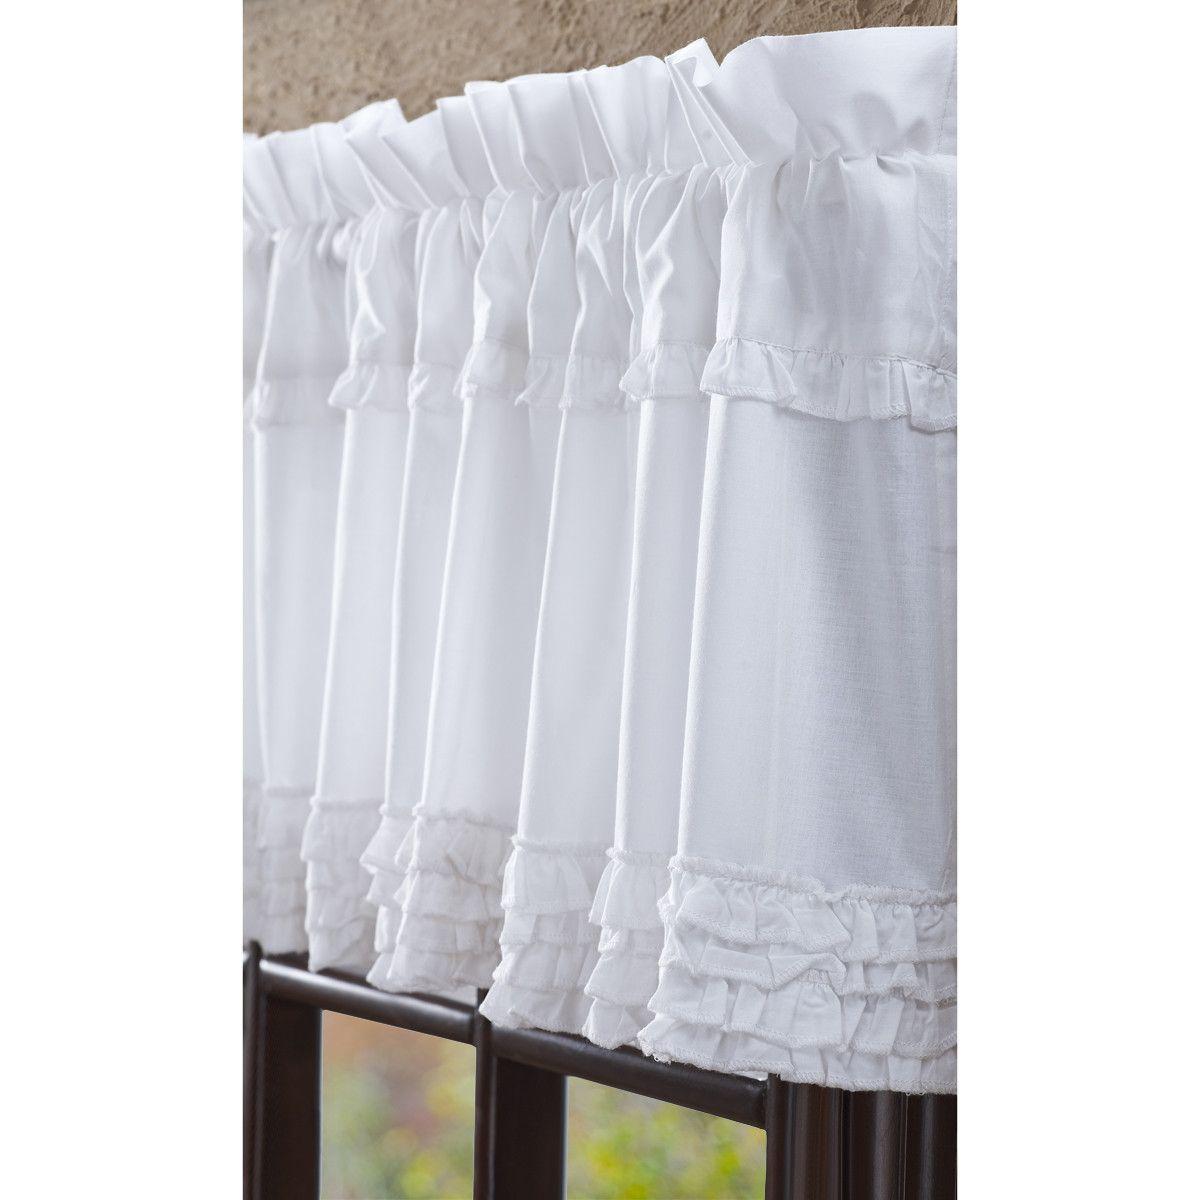 Tende Per Veranda Cucina baldwin white ruffled sheer unlined window valance (con